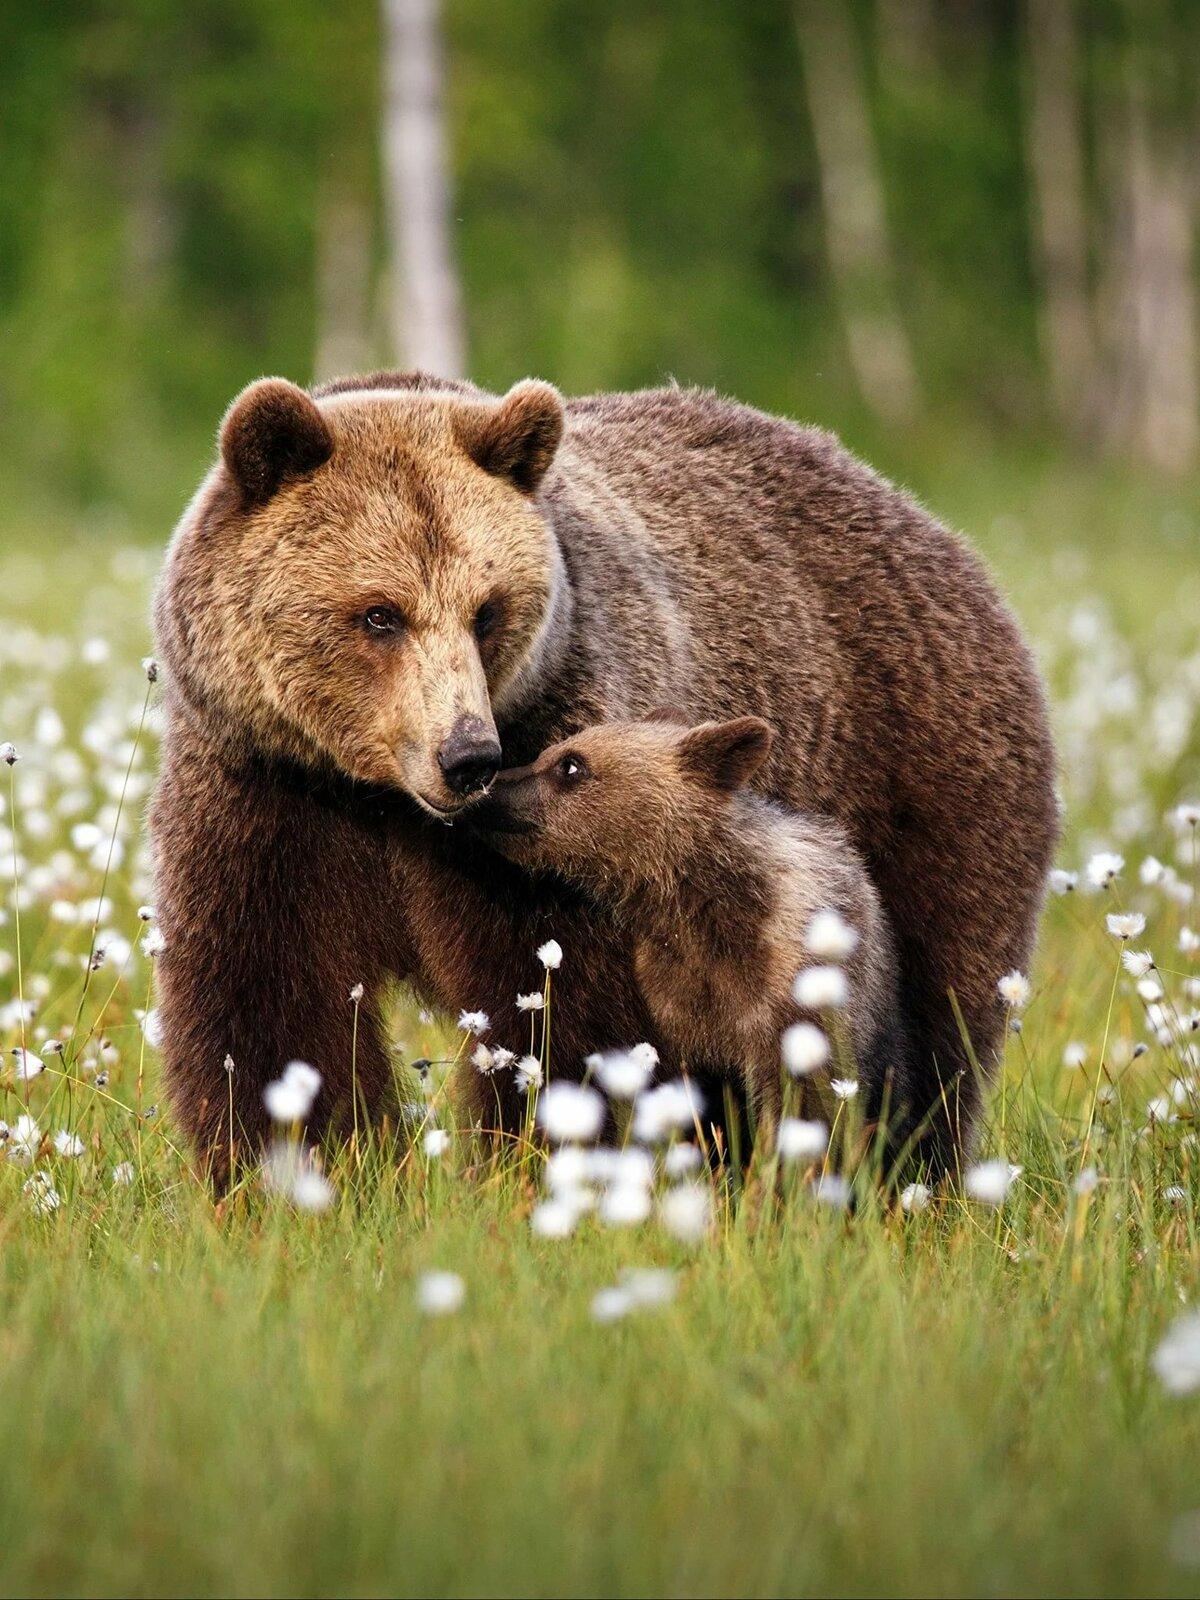 Фотки с медвежатами